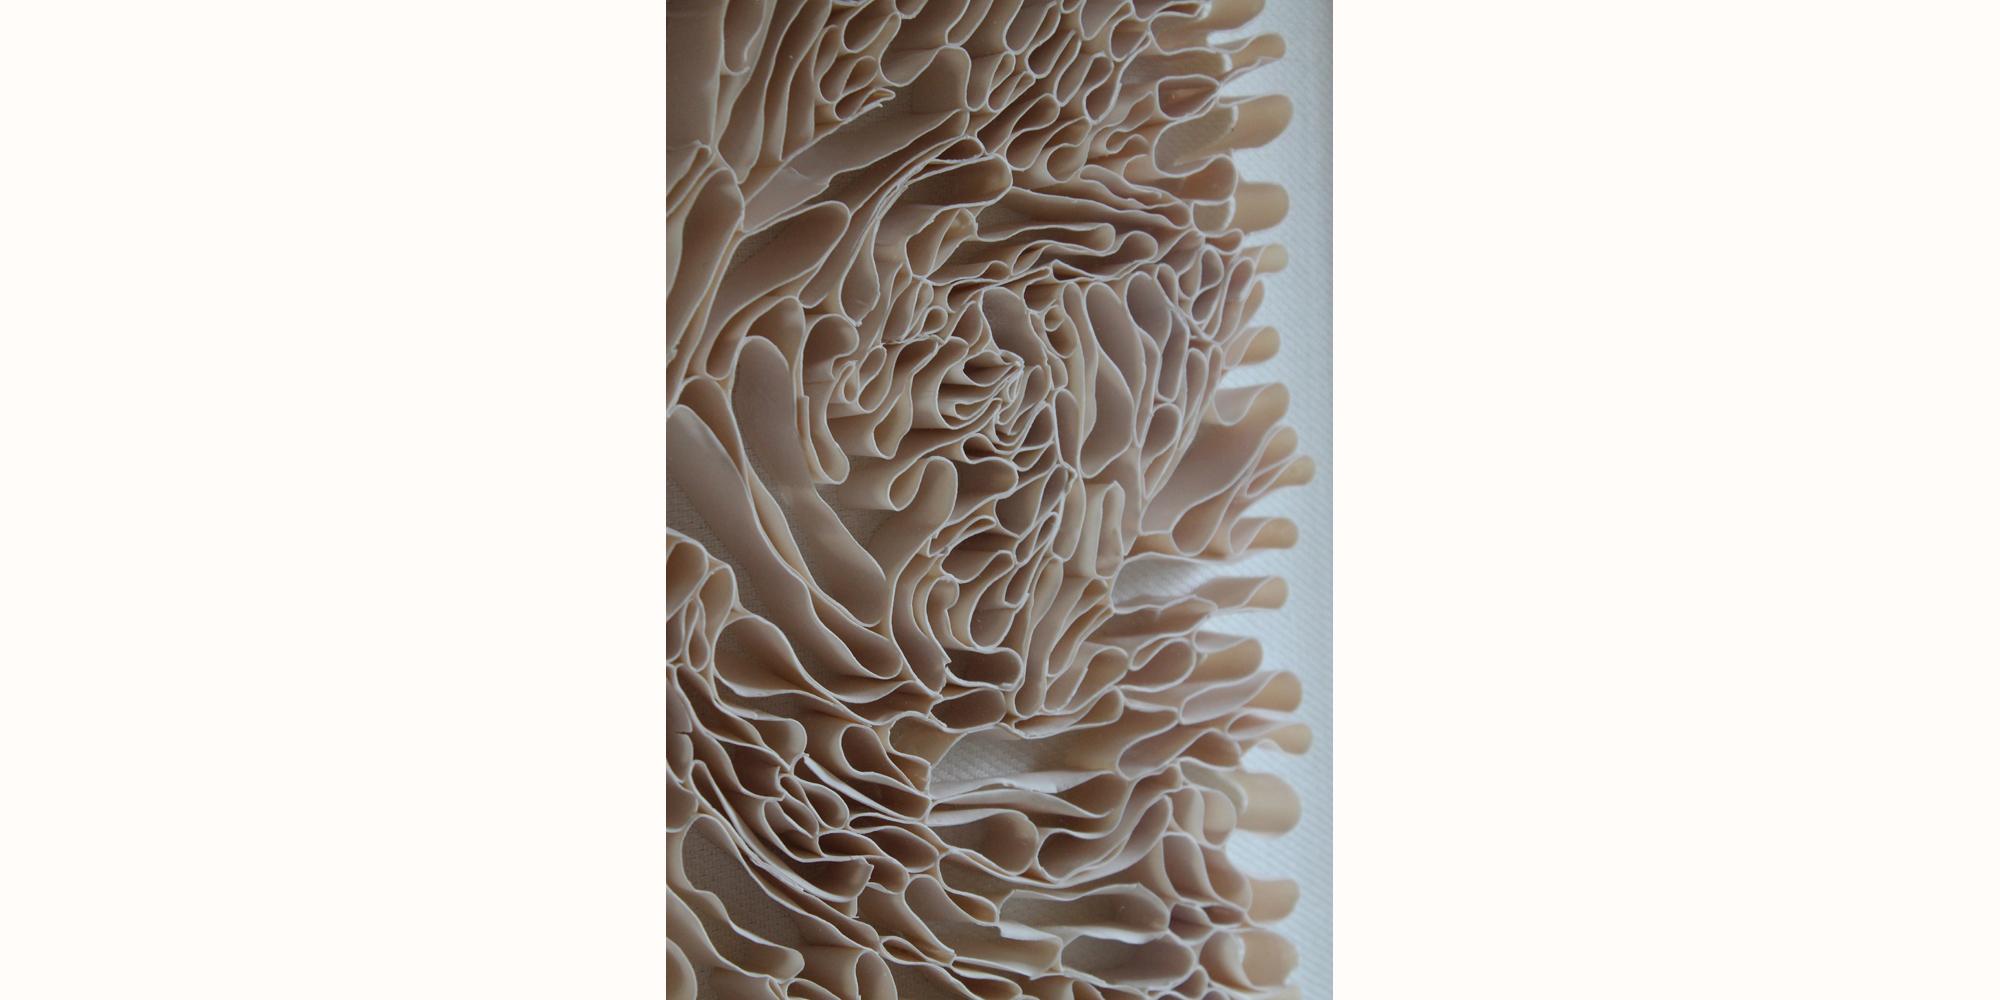 a6_ceramics_manufactured_fenellaelms_mdby_mdba